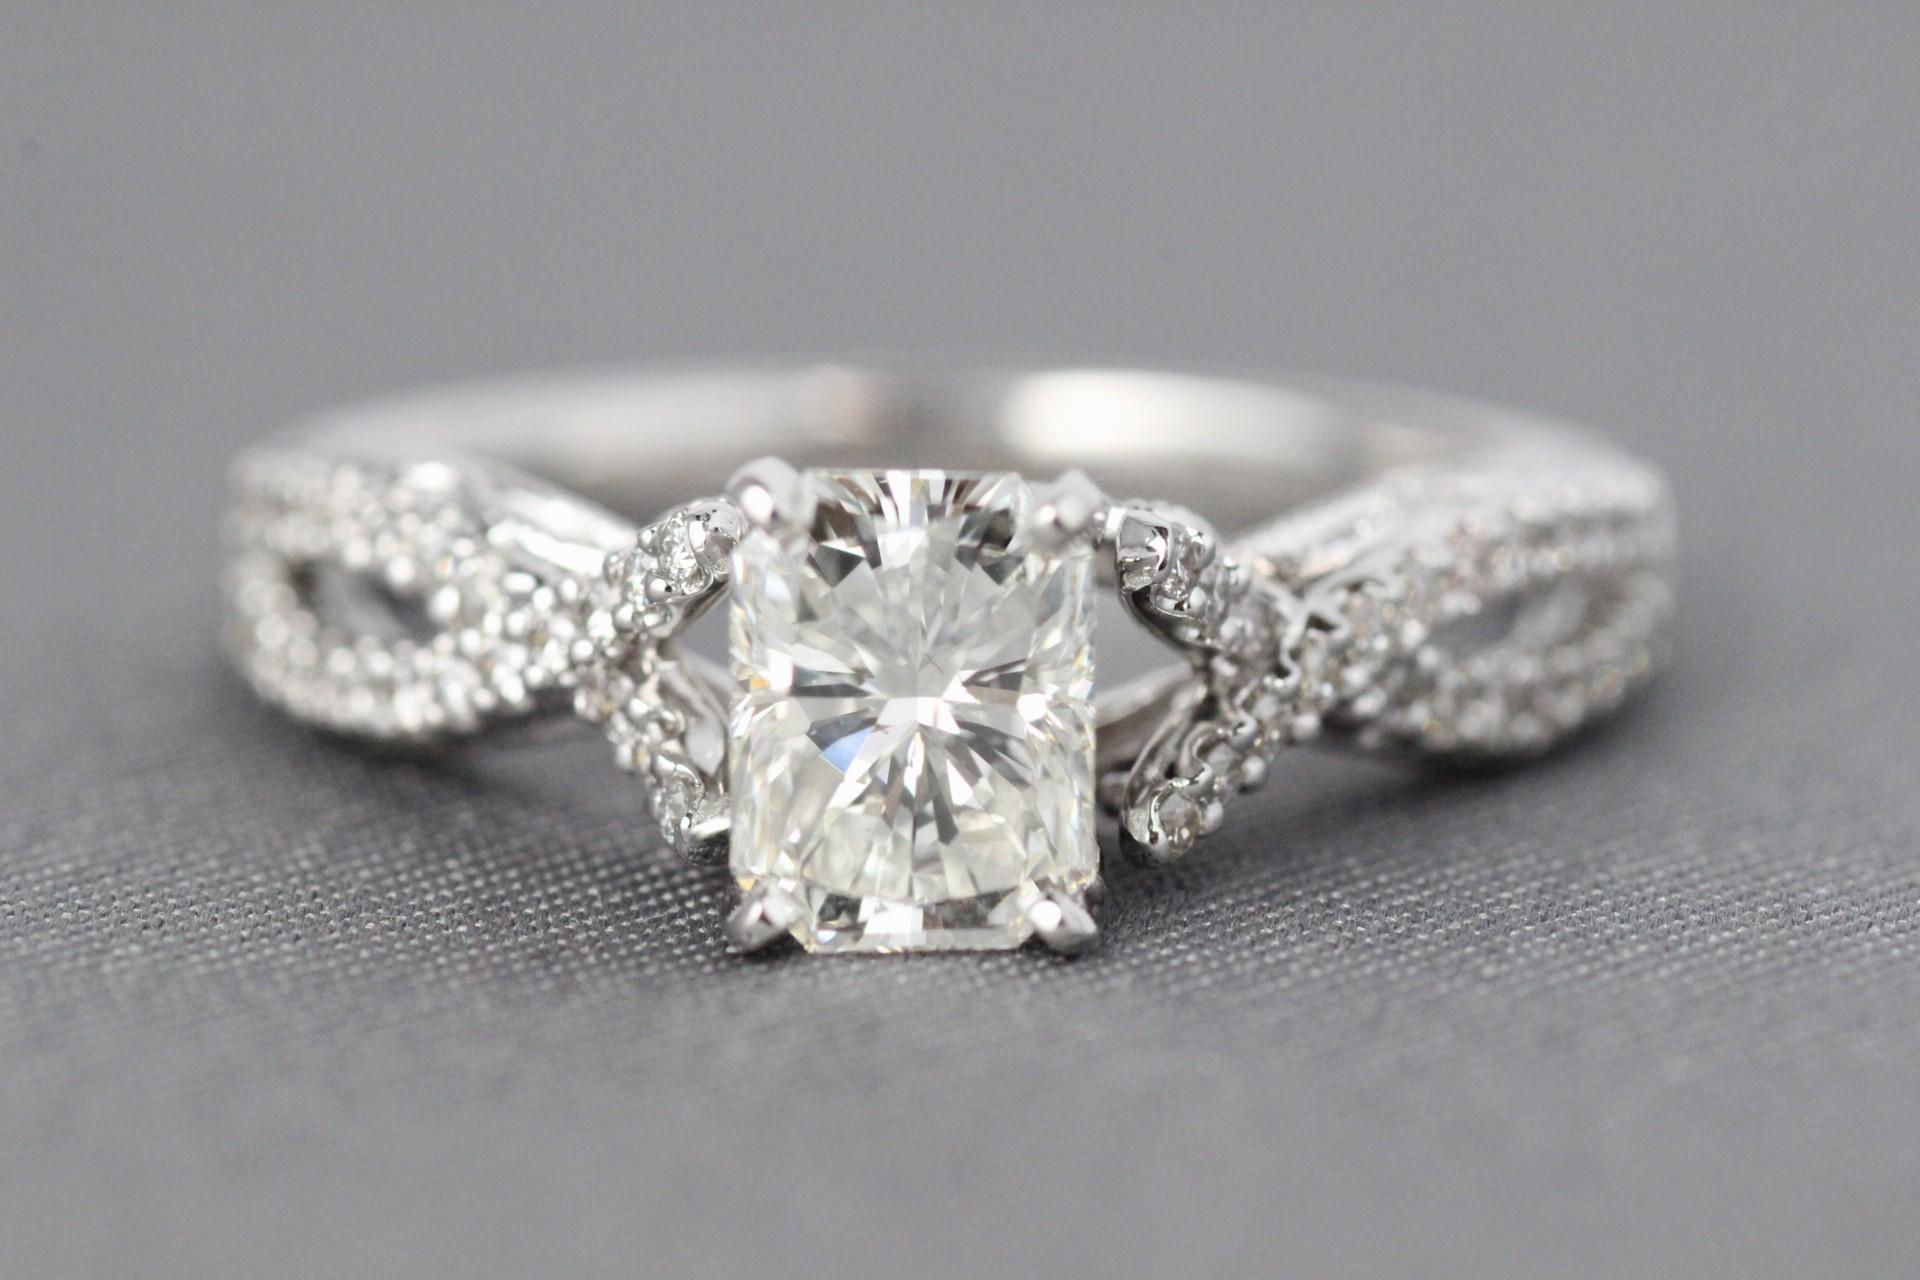 18 Karat diamond engagement ring with Radiant diamond.